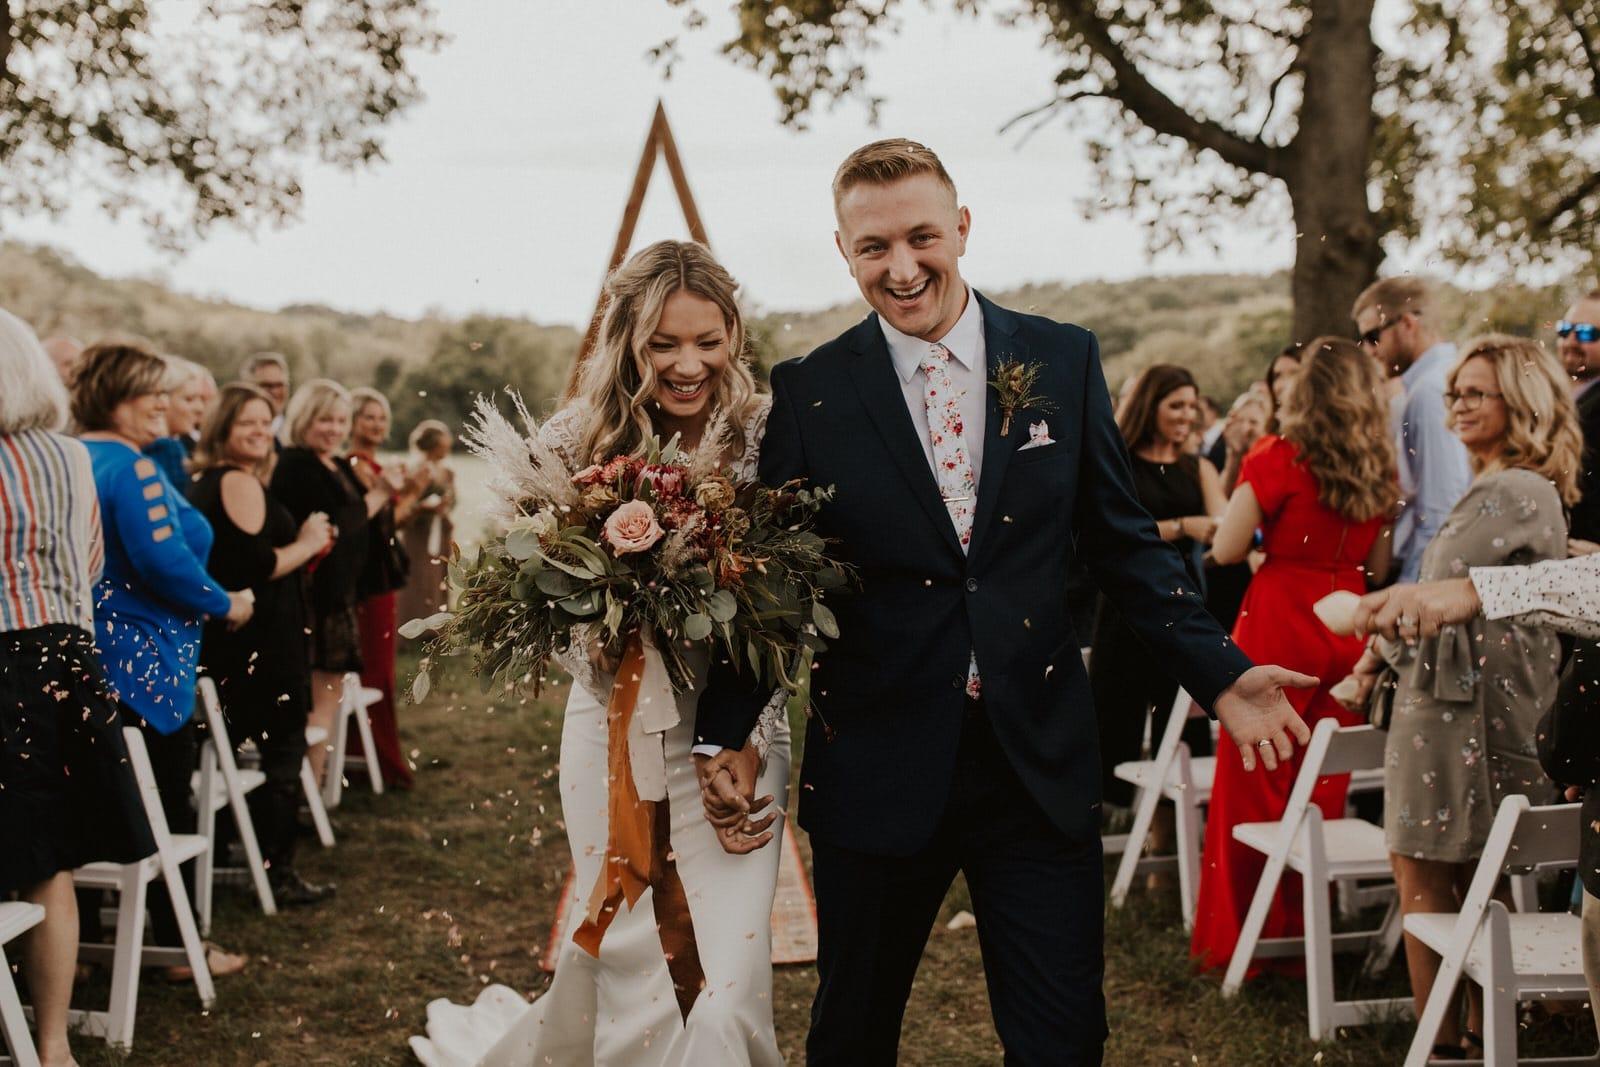 StLouis-Wedding-Photographer-AshlynAustin5-large